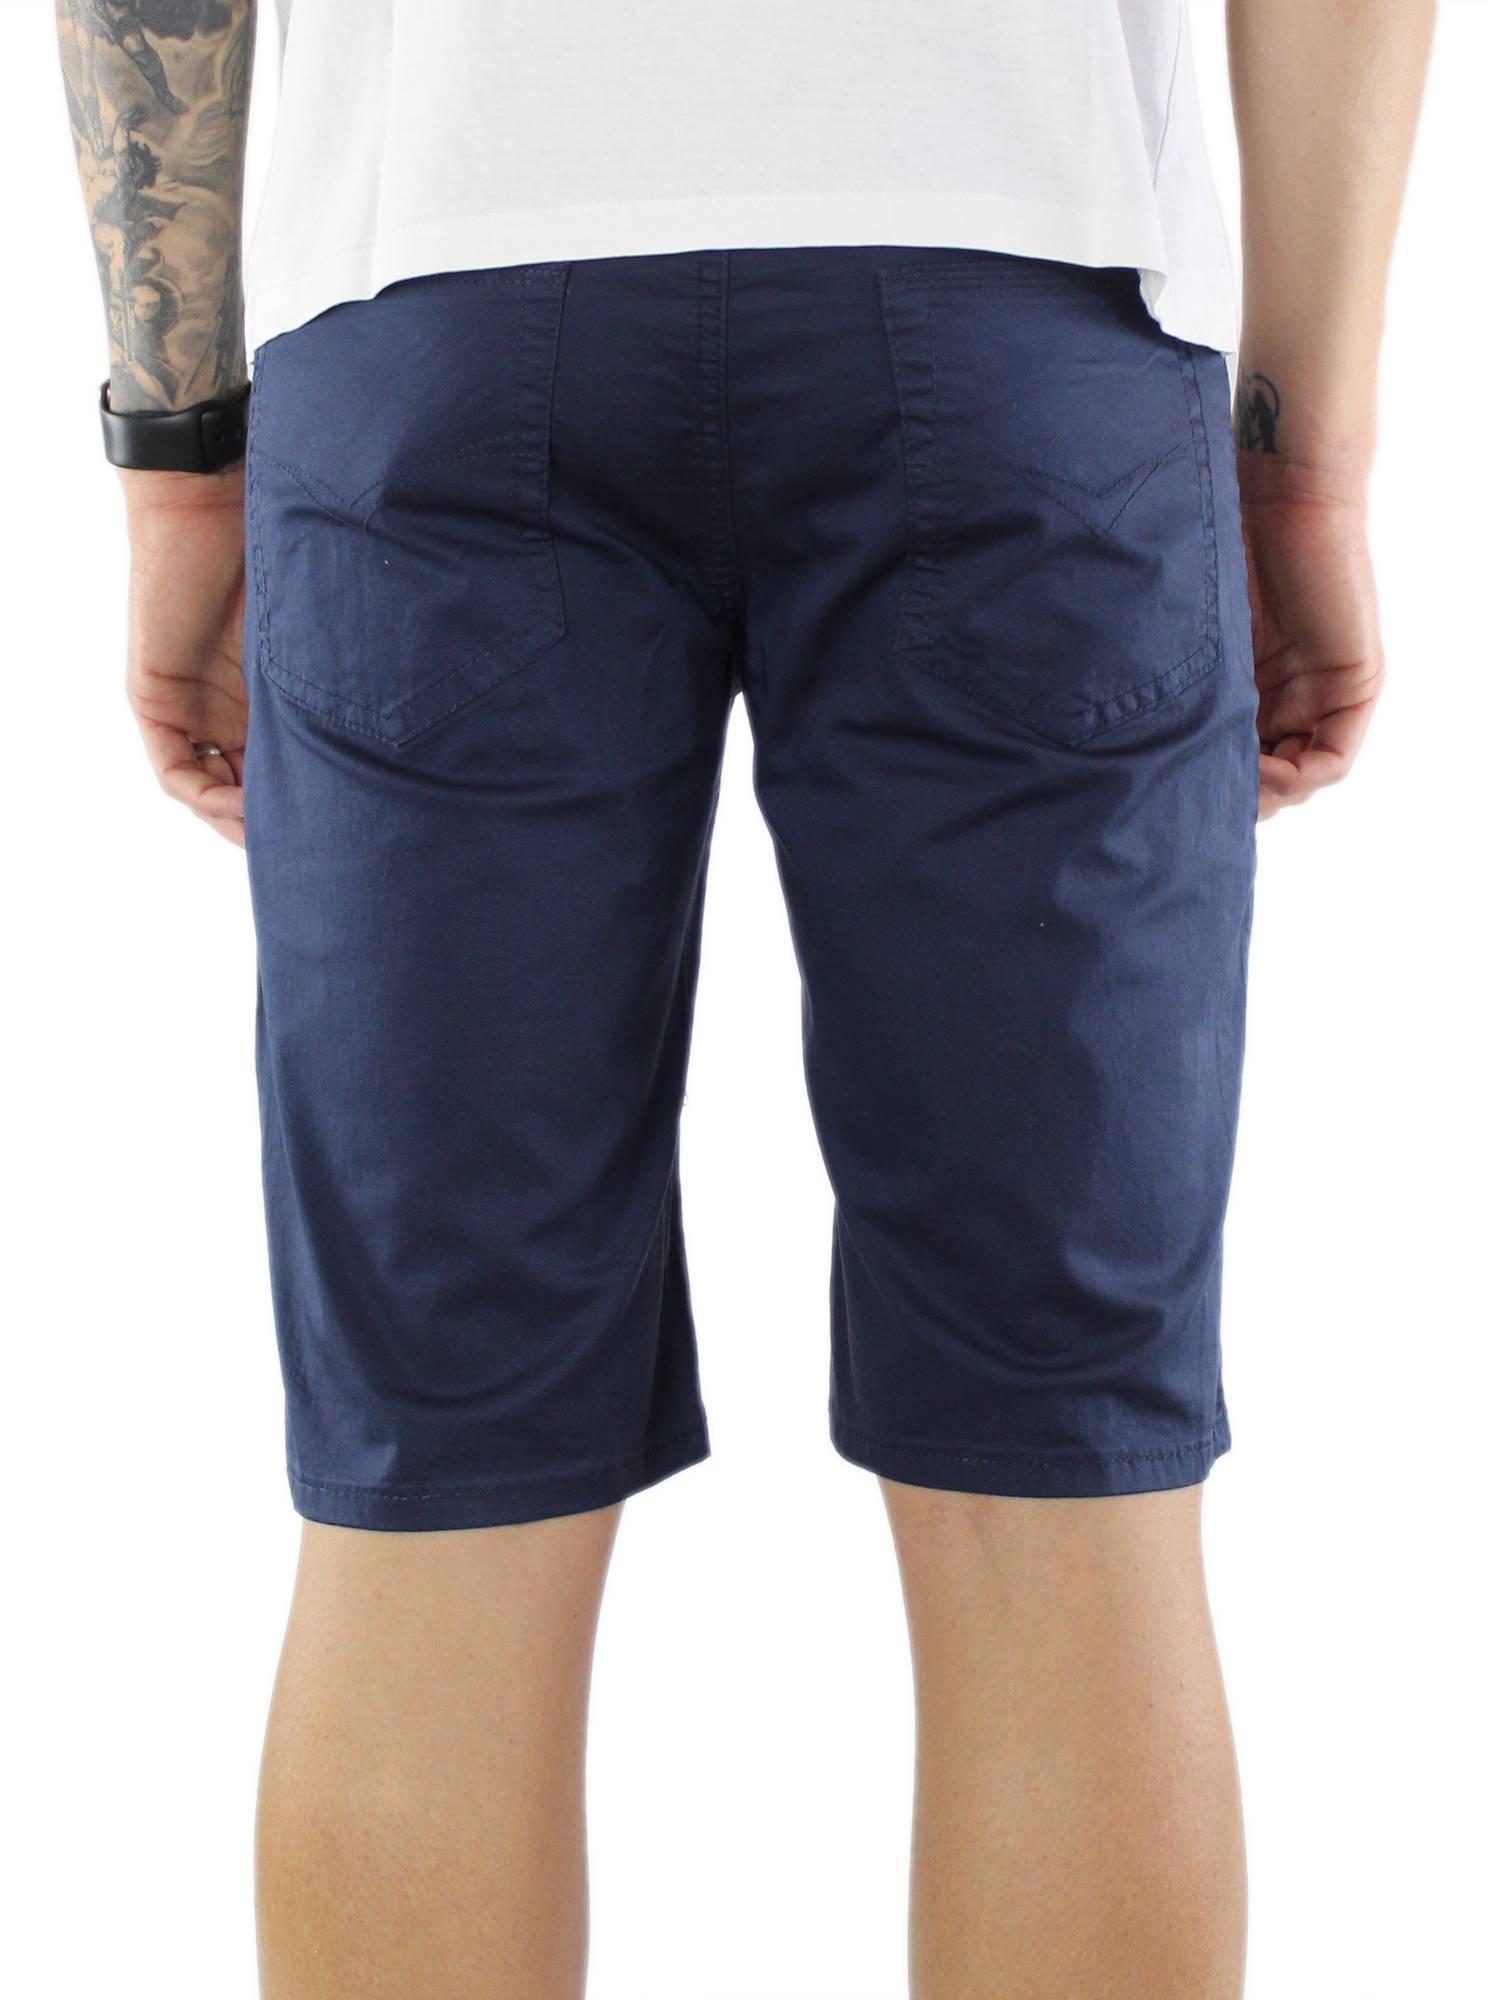 Bermuda-Uomo-Cotone-Slim-Fit-Pantalone-Corto-Shorts-Pantaloncini-Casual miniatuur 13